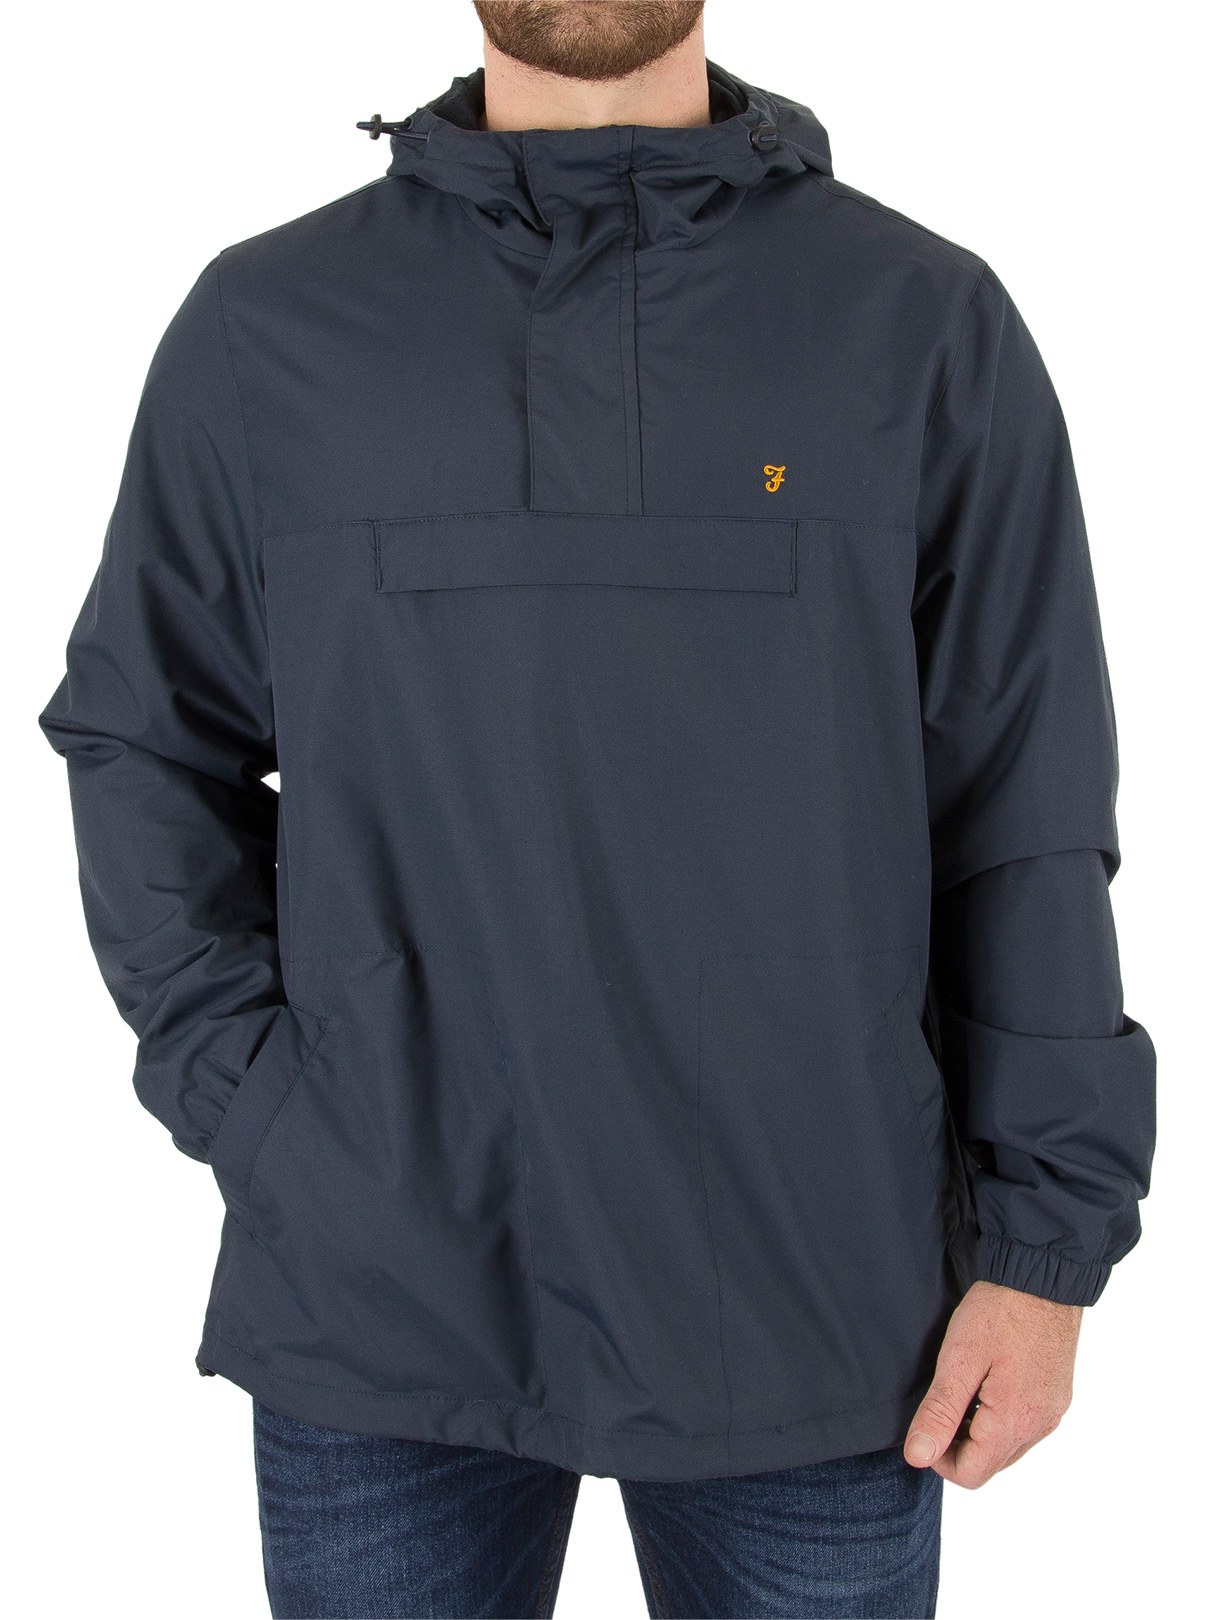 Farah Vintage True Navy Clydesdale Pullover Jacket